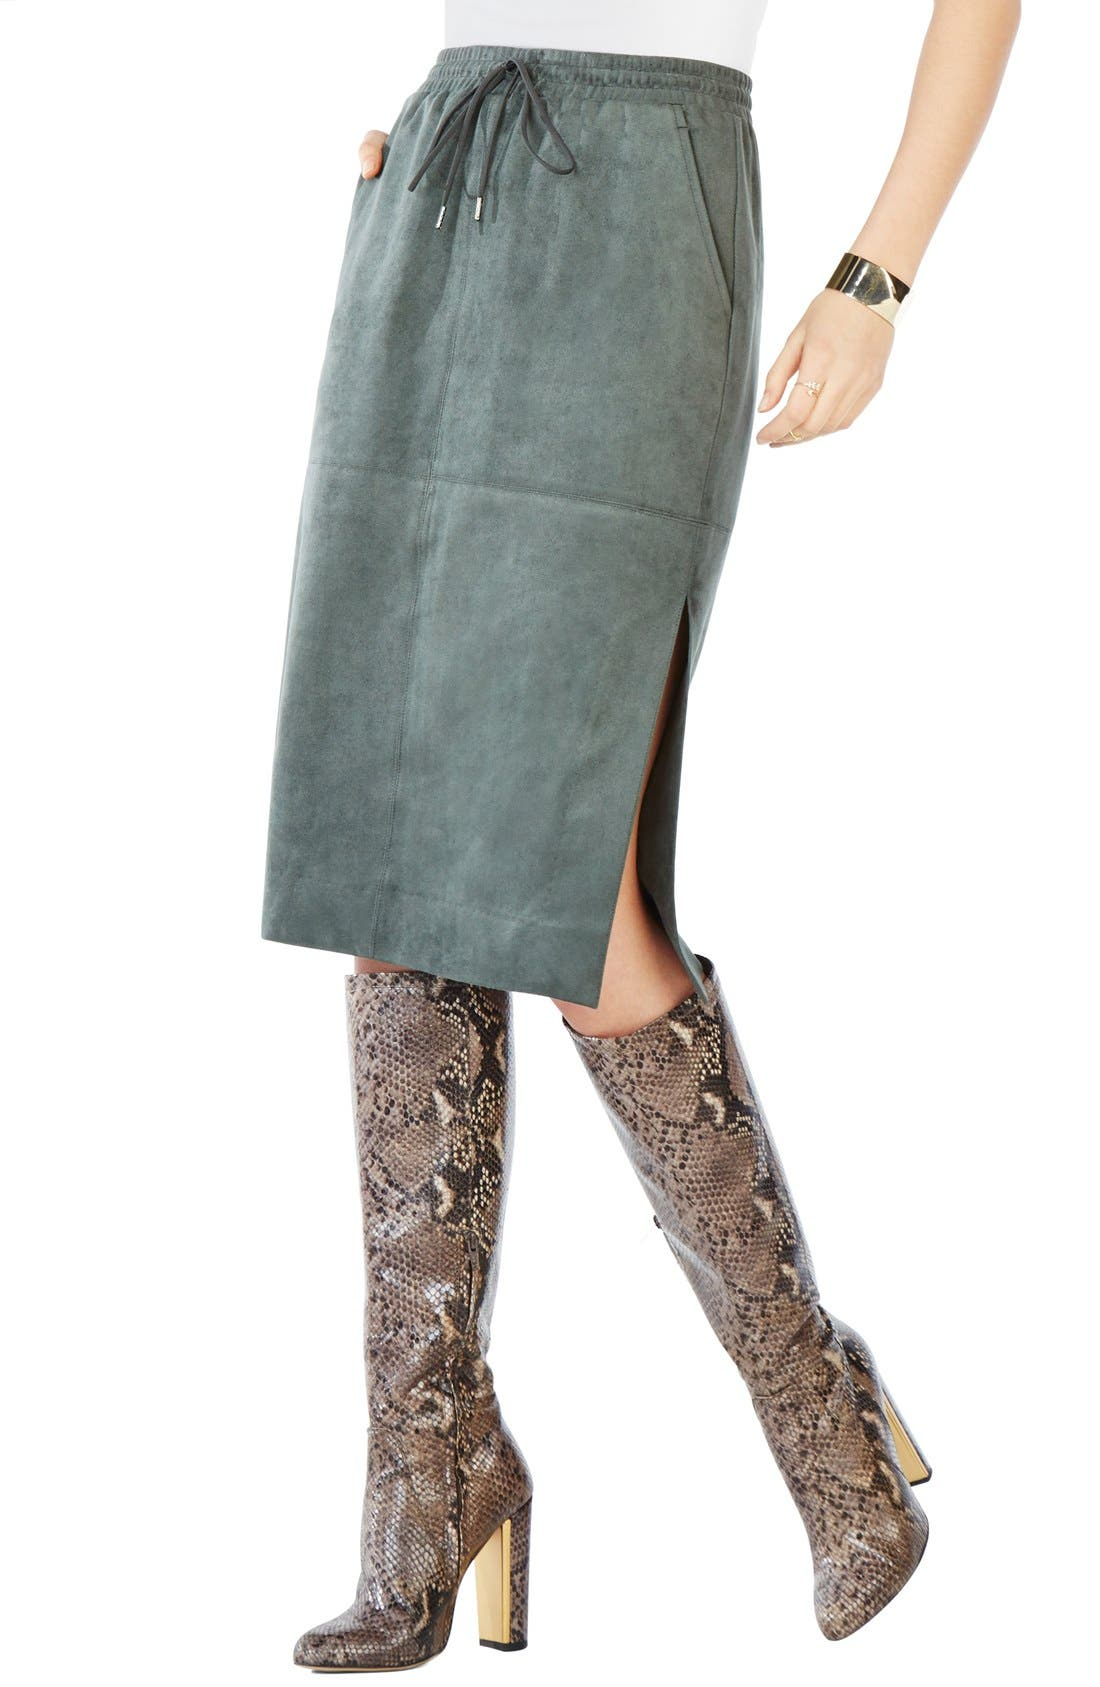 Main Image - BCBGMAXAZRIA 'Zandra' Faux Suede Pencil Skirt